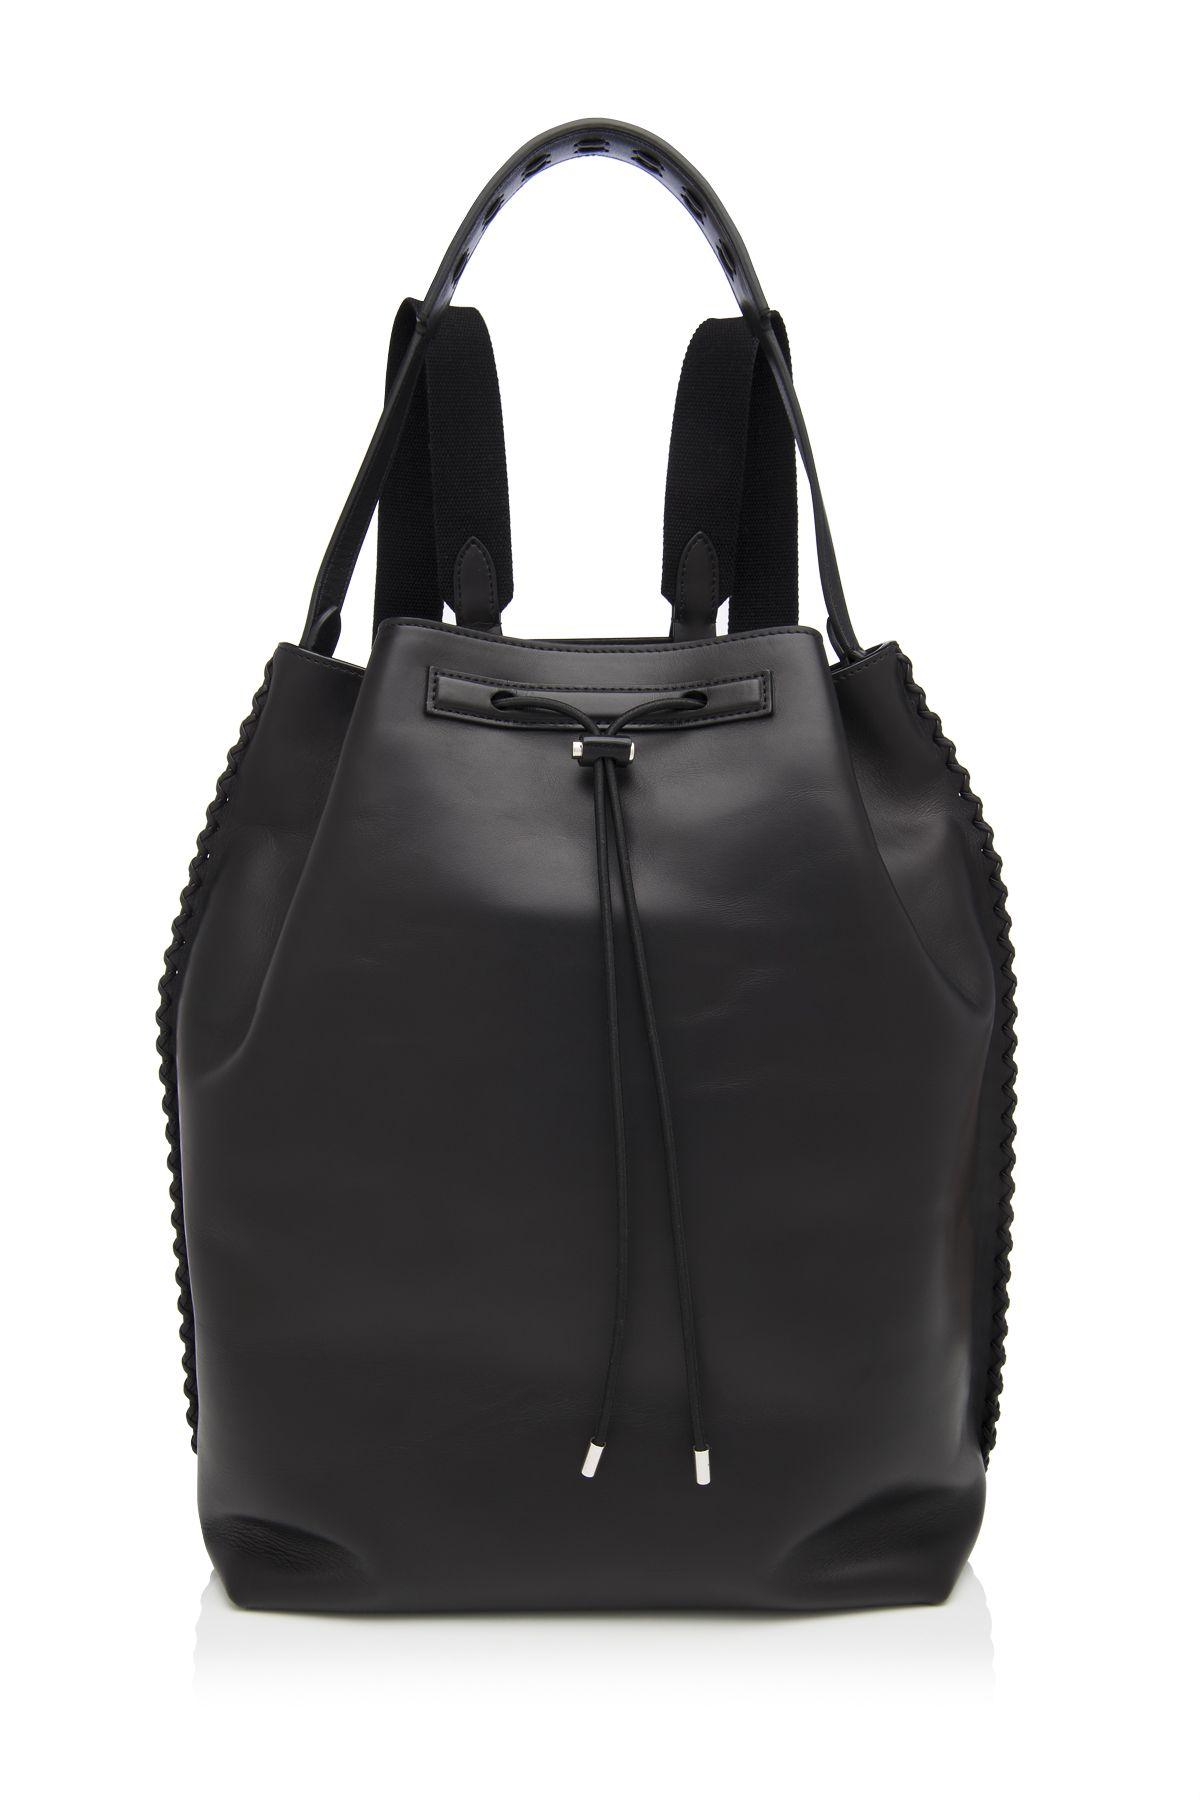 The Row gearshift Bags, Carryall, Gear bag